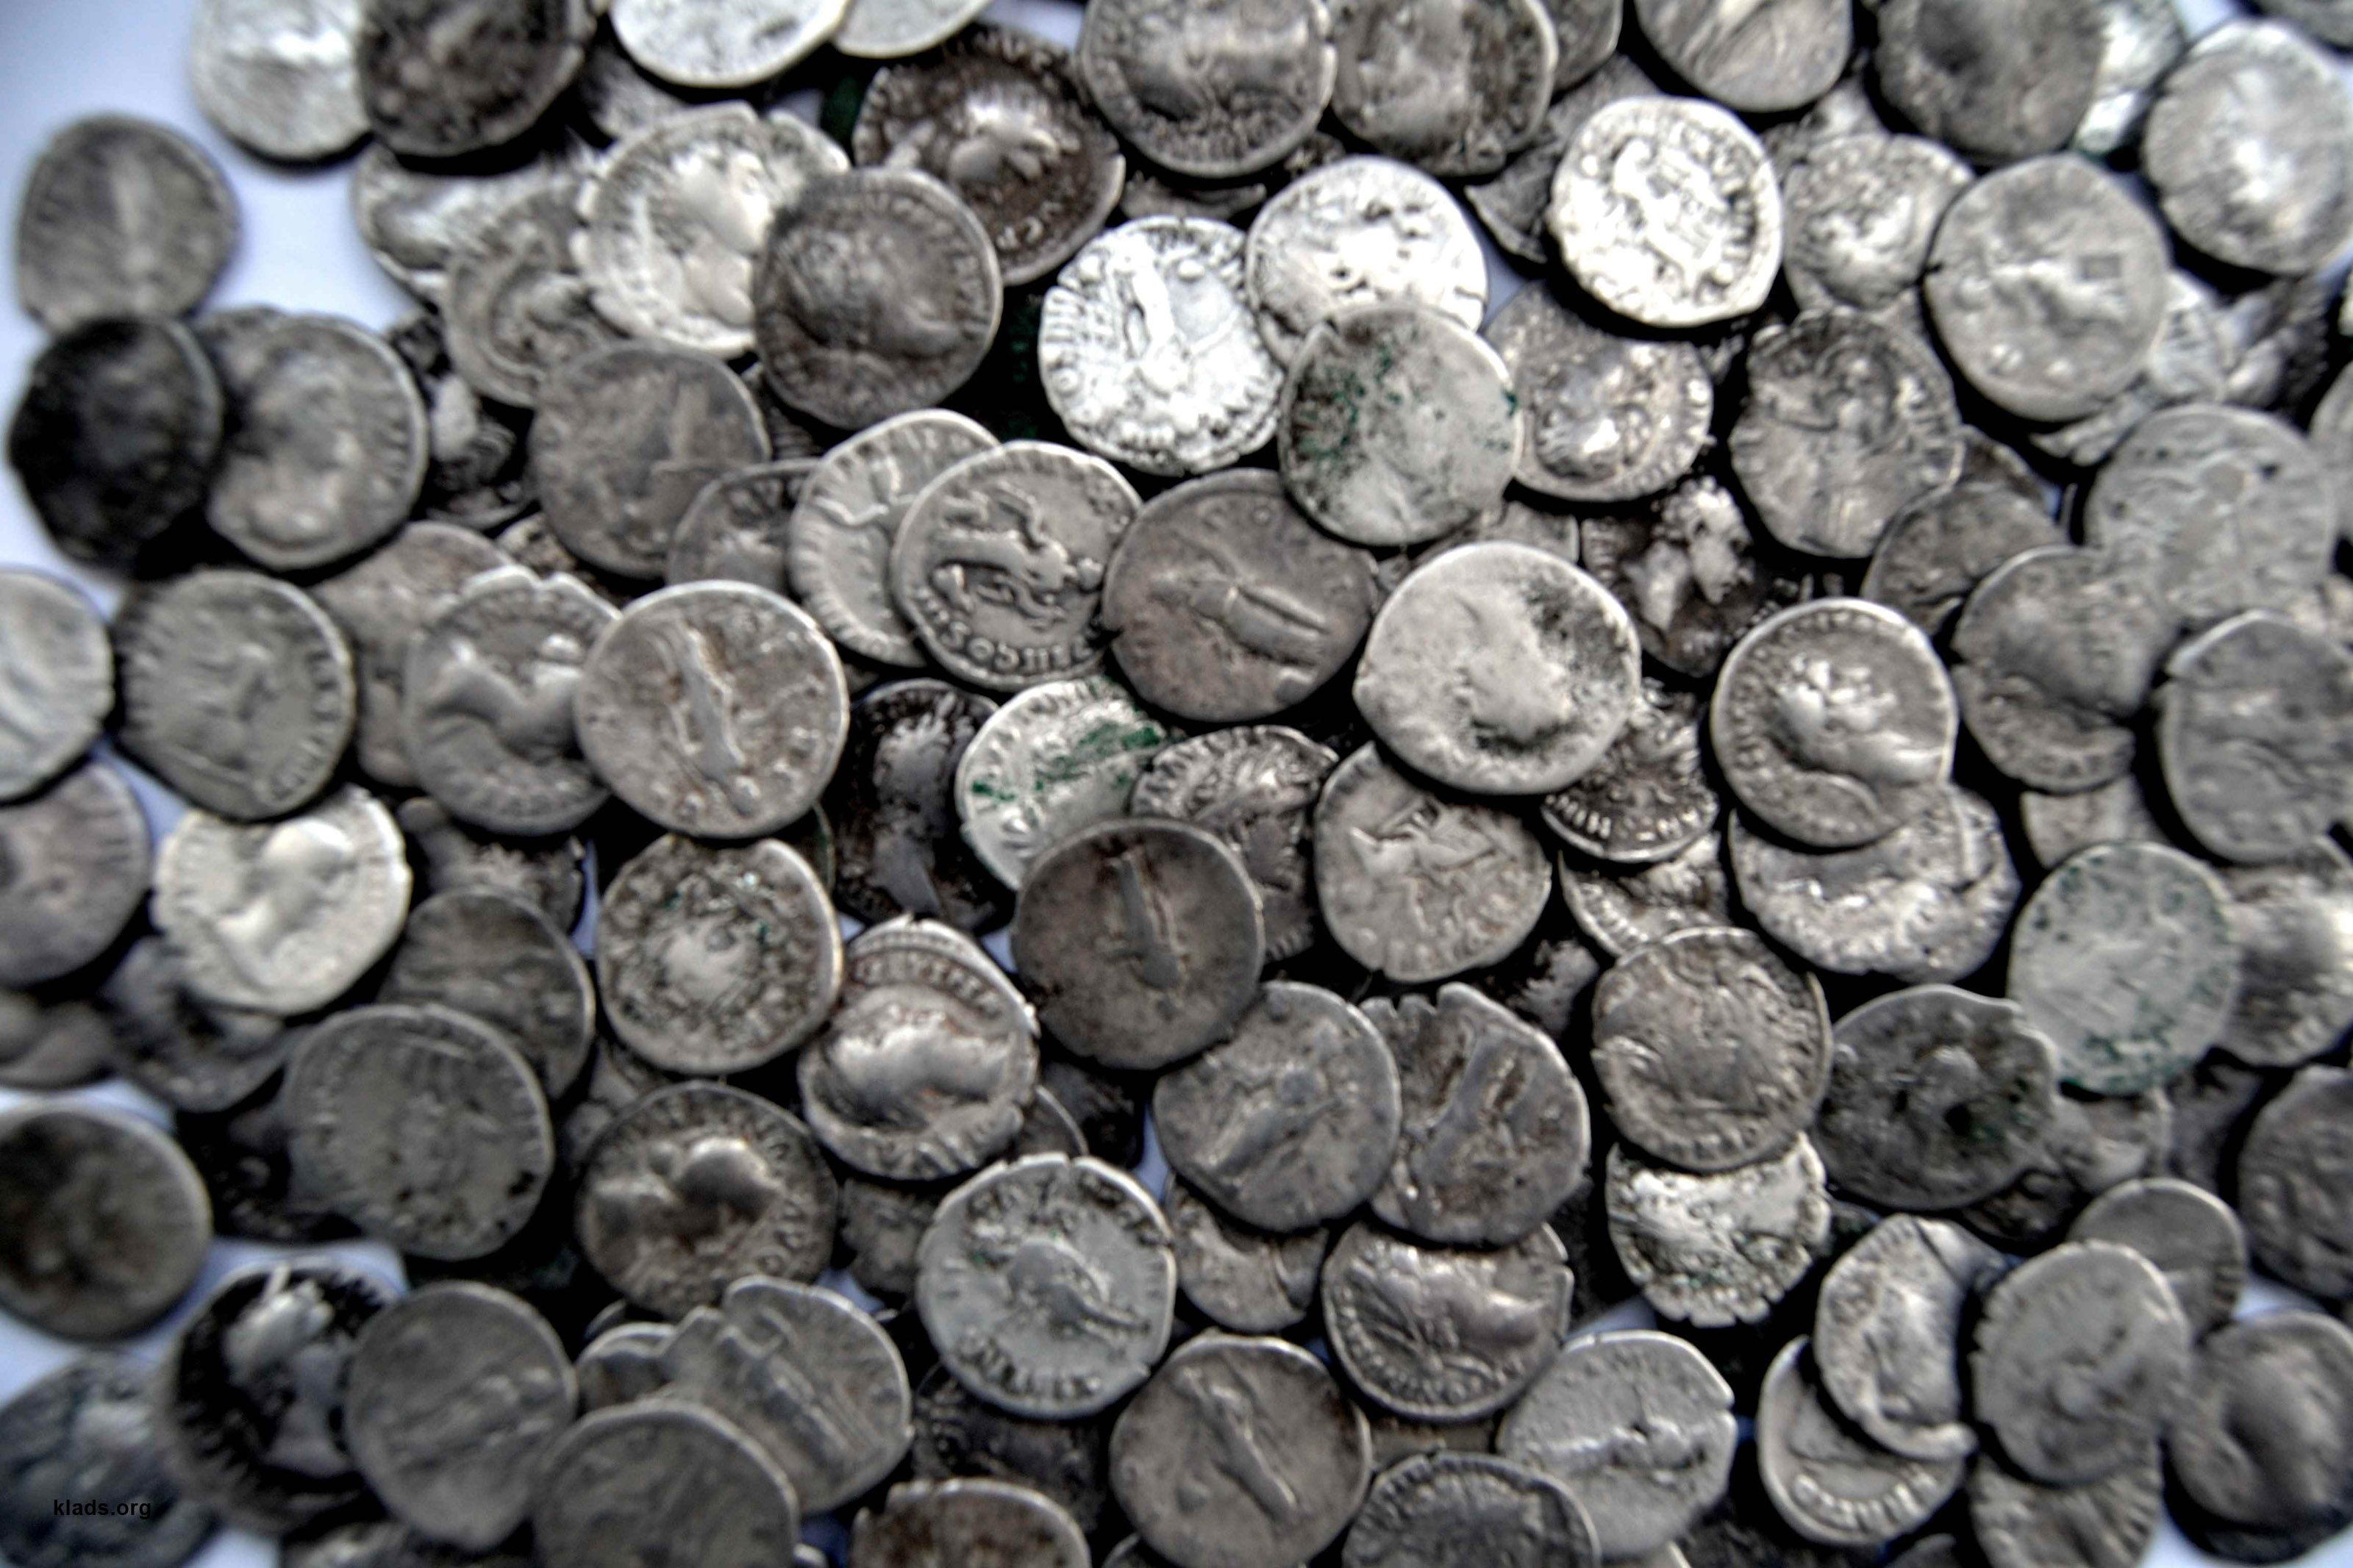 http://klads.org/wp-content/uploads/2015/05/hoard-Roman-coins.jpg